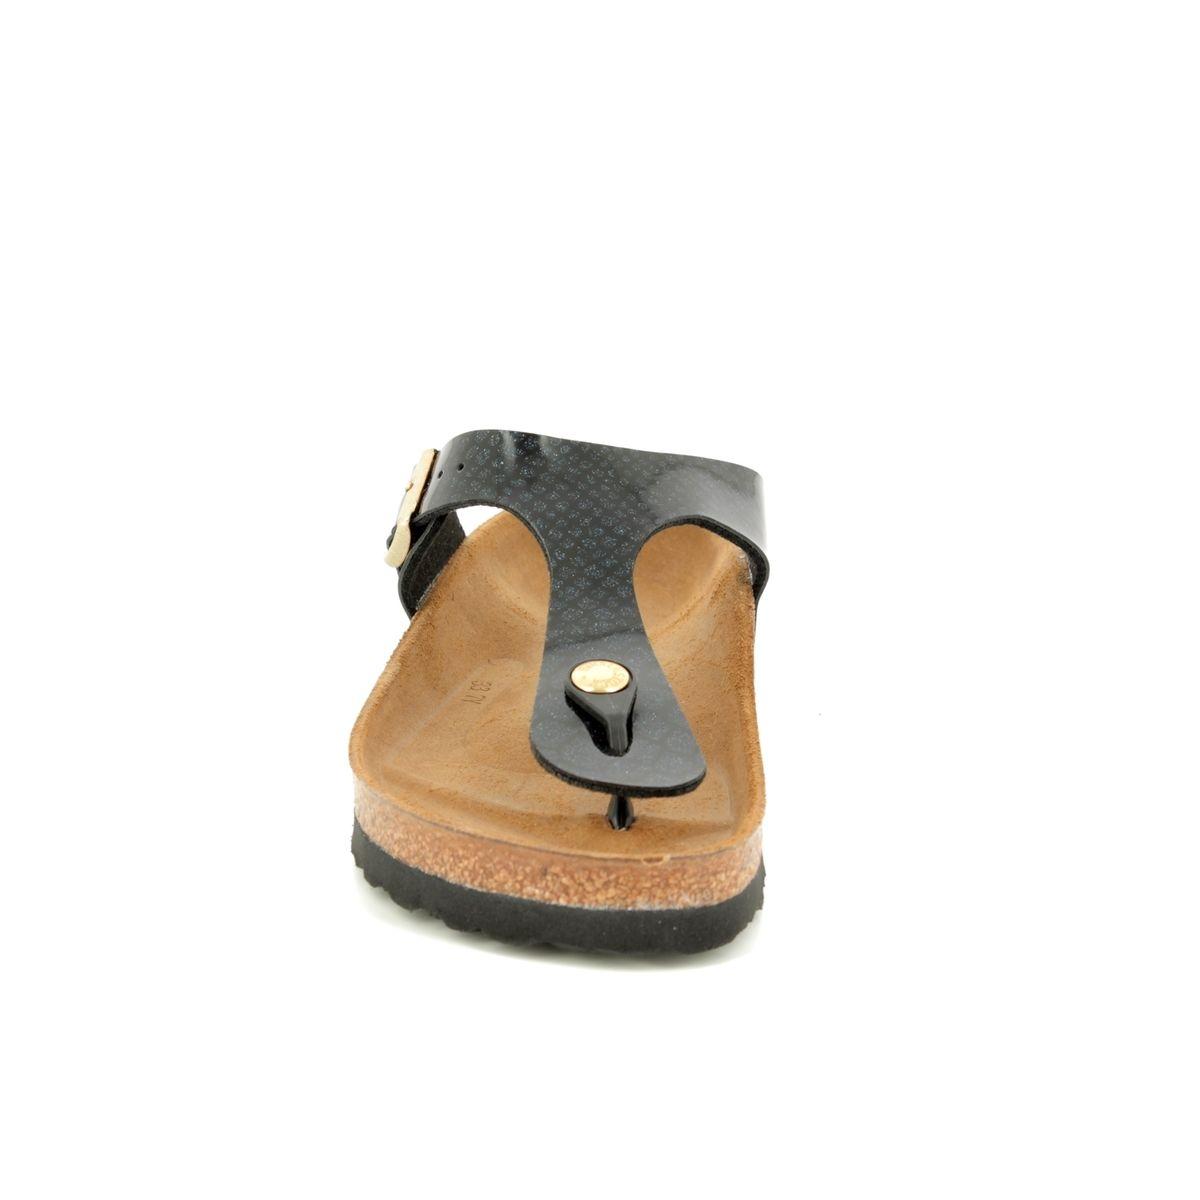 87905d378cba Birkenstock Toe Post Sandals - Black patent - 1009114 GIZEH MAGIC SNAKE